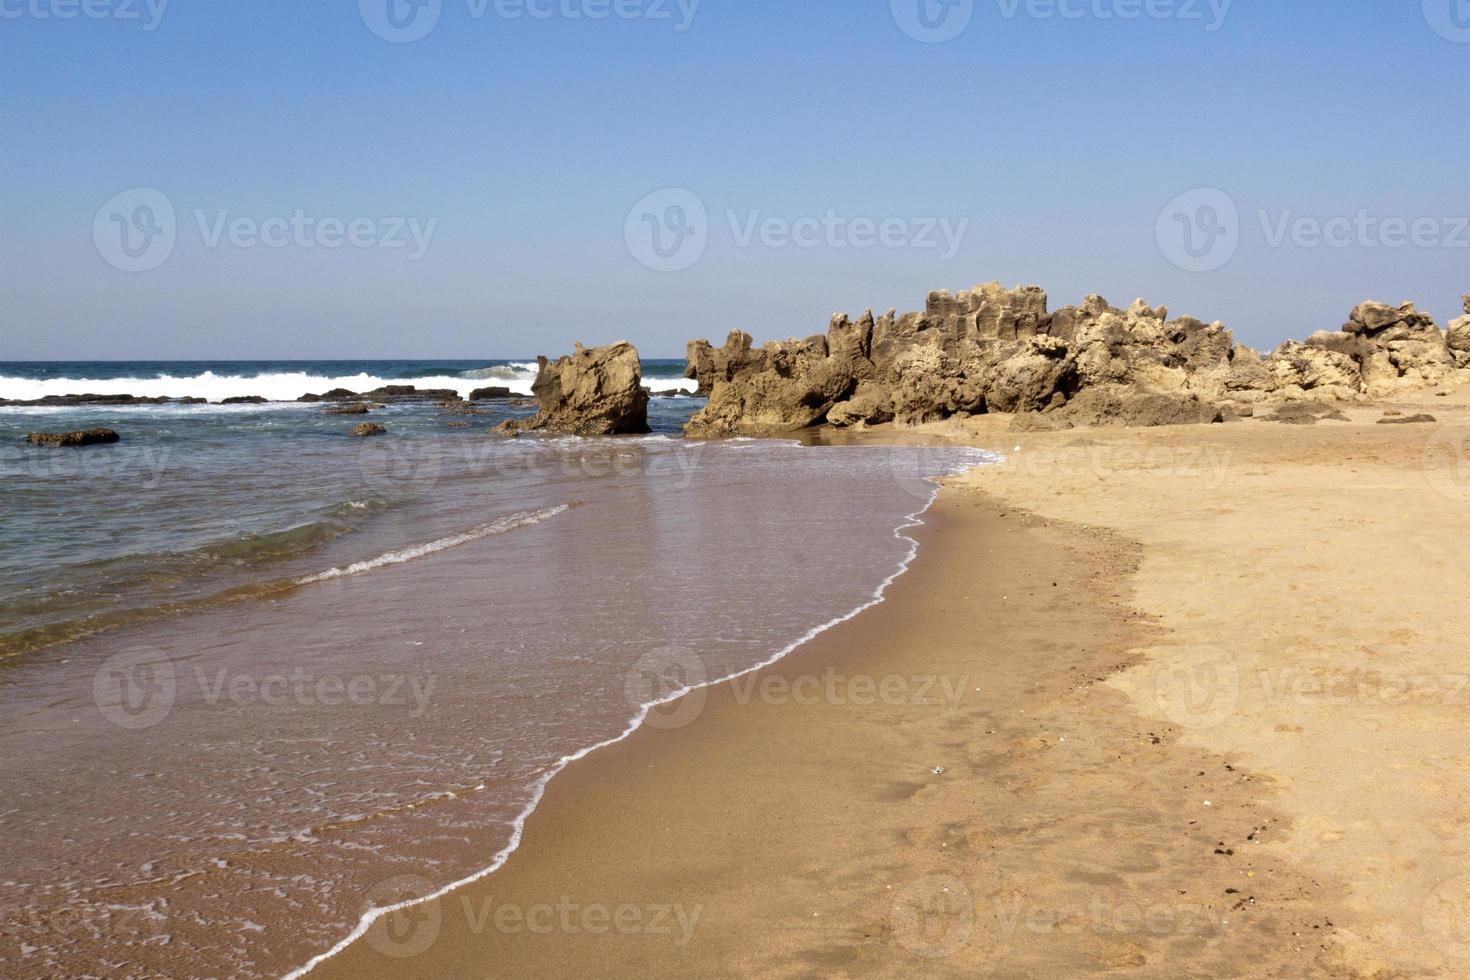 Rough Rock Formation at Umdloti Beach, Durban South Africa photo